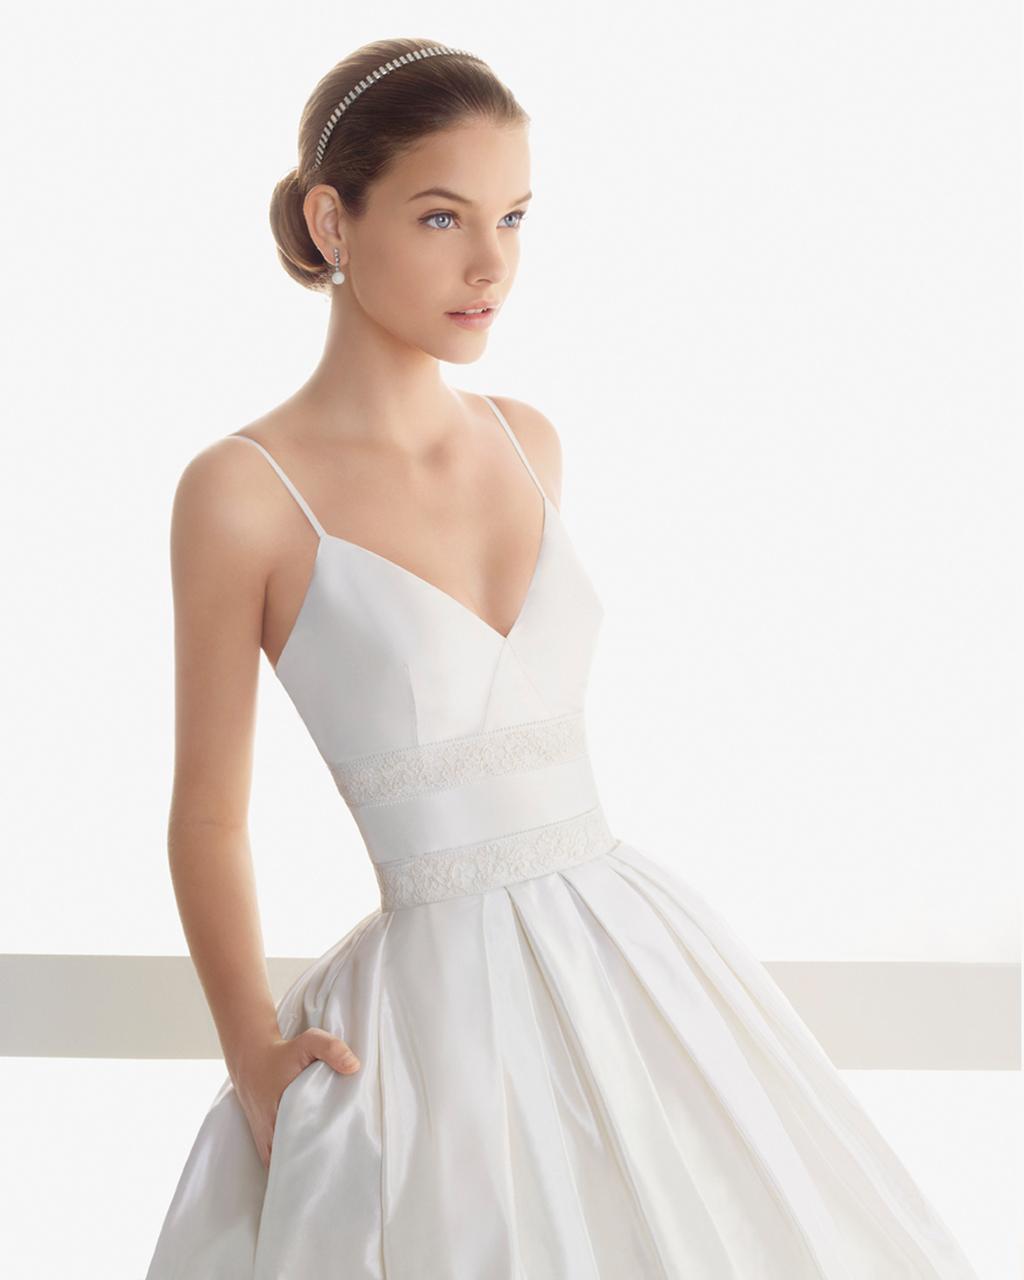 Transforming-wedding-dresses-2013-bridal-gown-by-rosa-clara-2.full